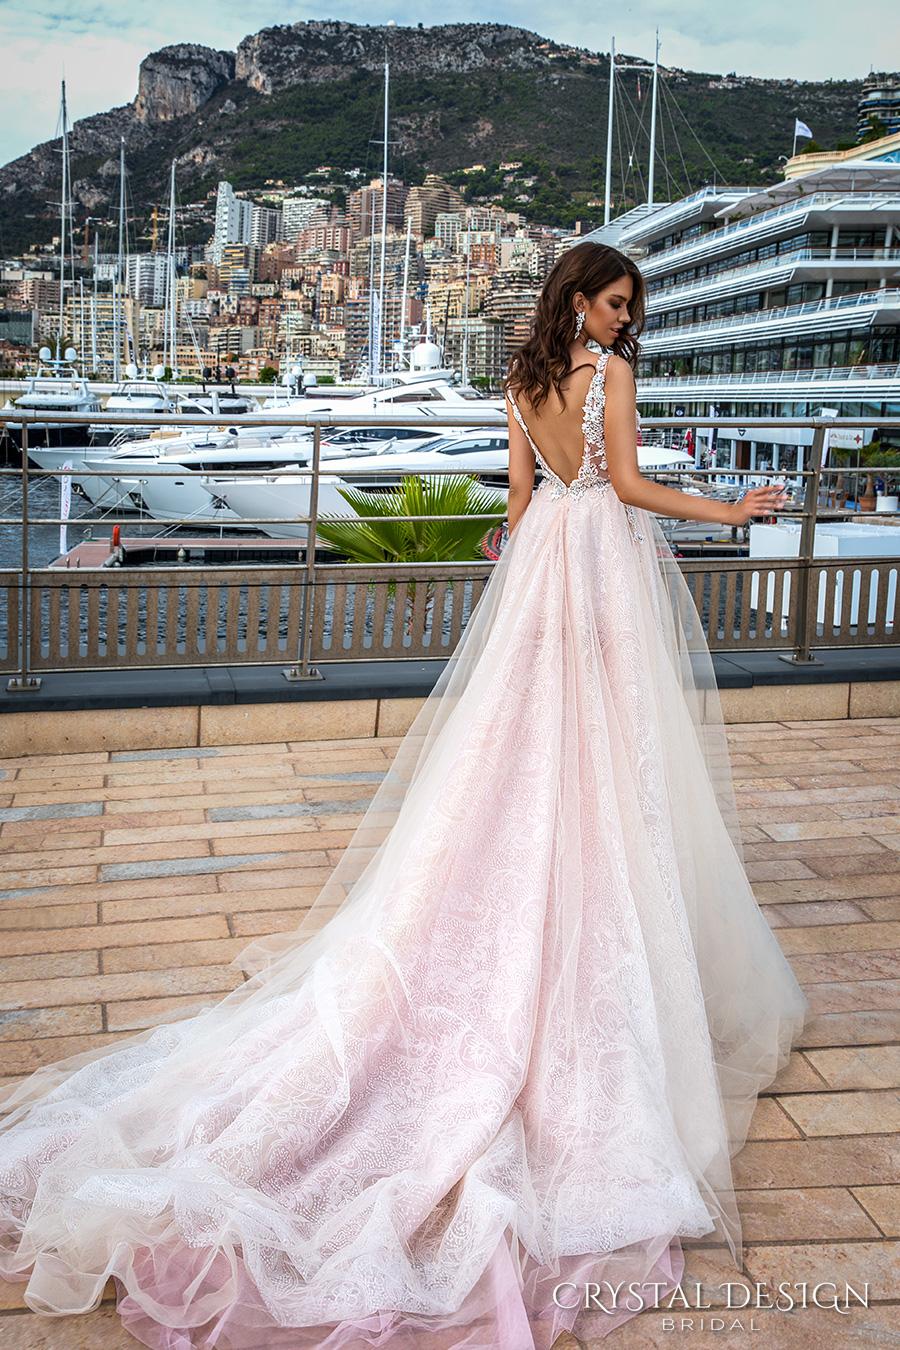 crystal-design-2017-bridal-sleeveless-v-neck-heavily-embellished-bodice-tulle-skirt-princess-romantic-blush-color-a-line-wedding-dress-low-back-long-royal-train-andrea-bv